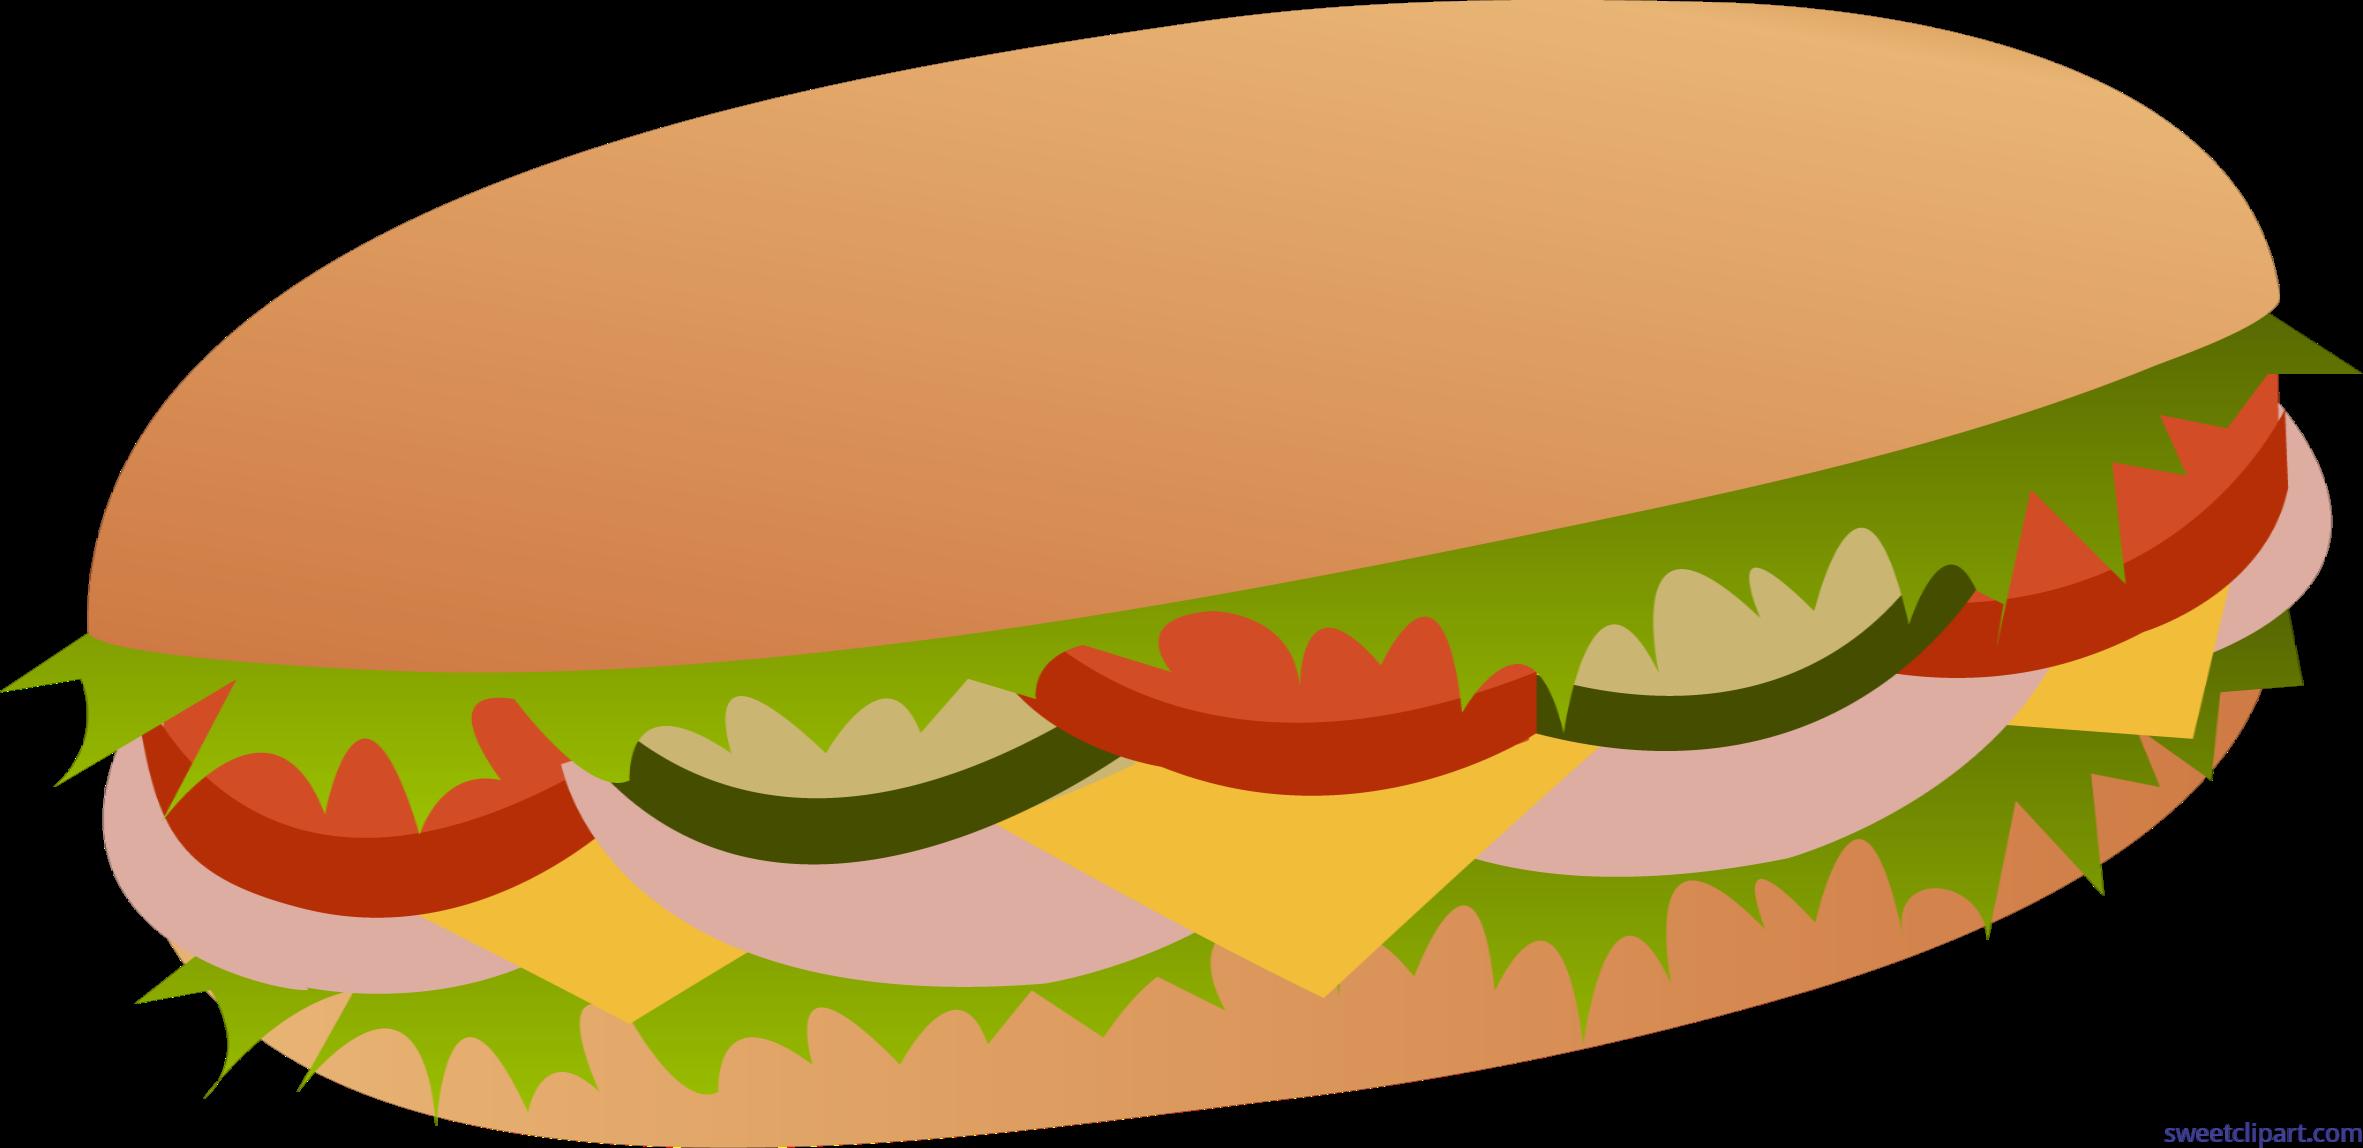 Turkey sandwich clipart image library Sandwich Clip Art - Sweet Clip Art image library